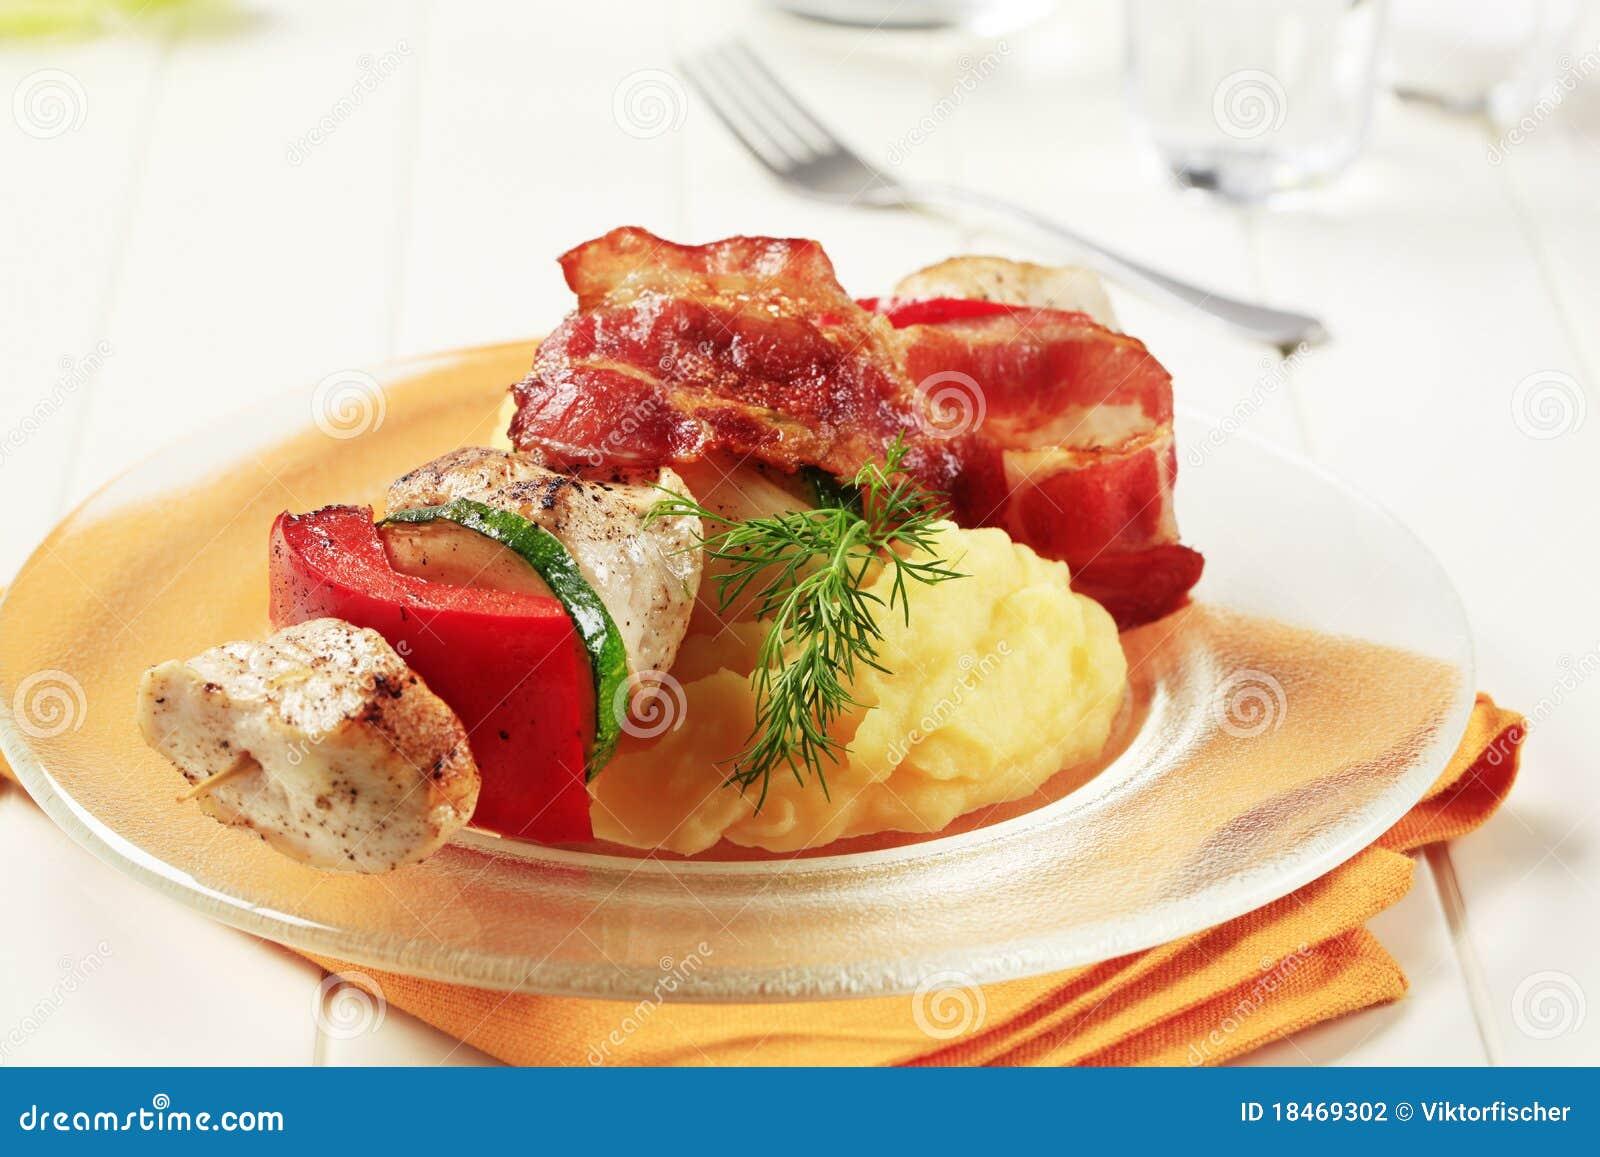 Chicken Shish Kebab And Mashed Potato Stock Photography - Image ...